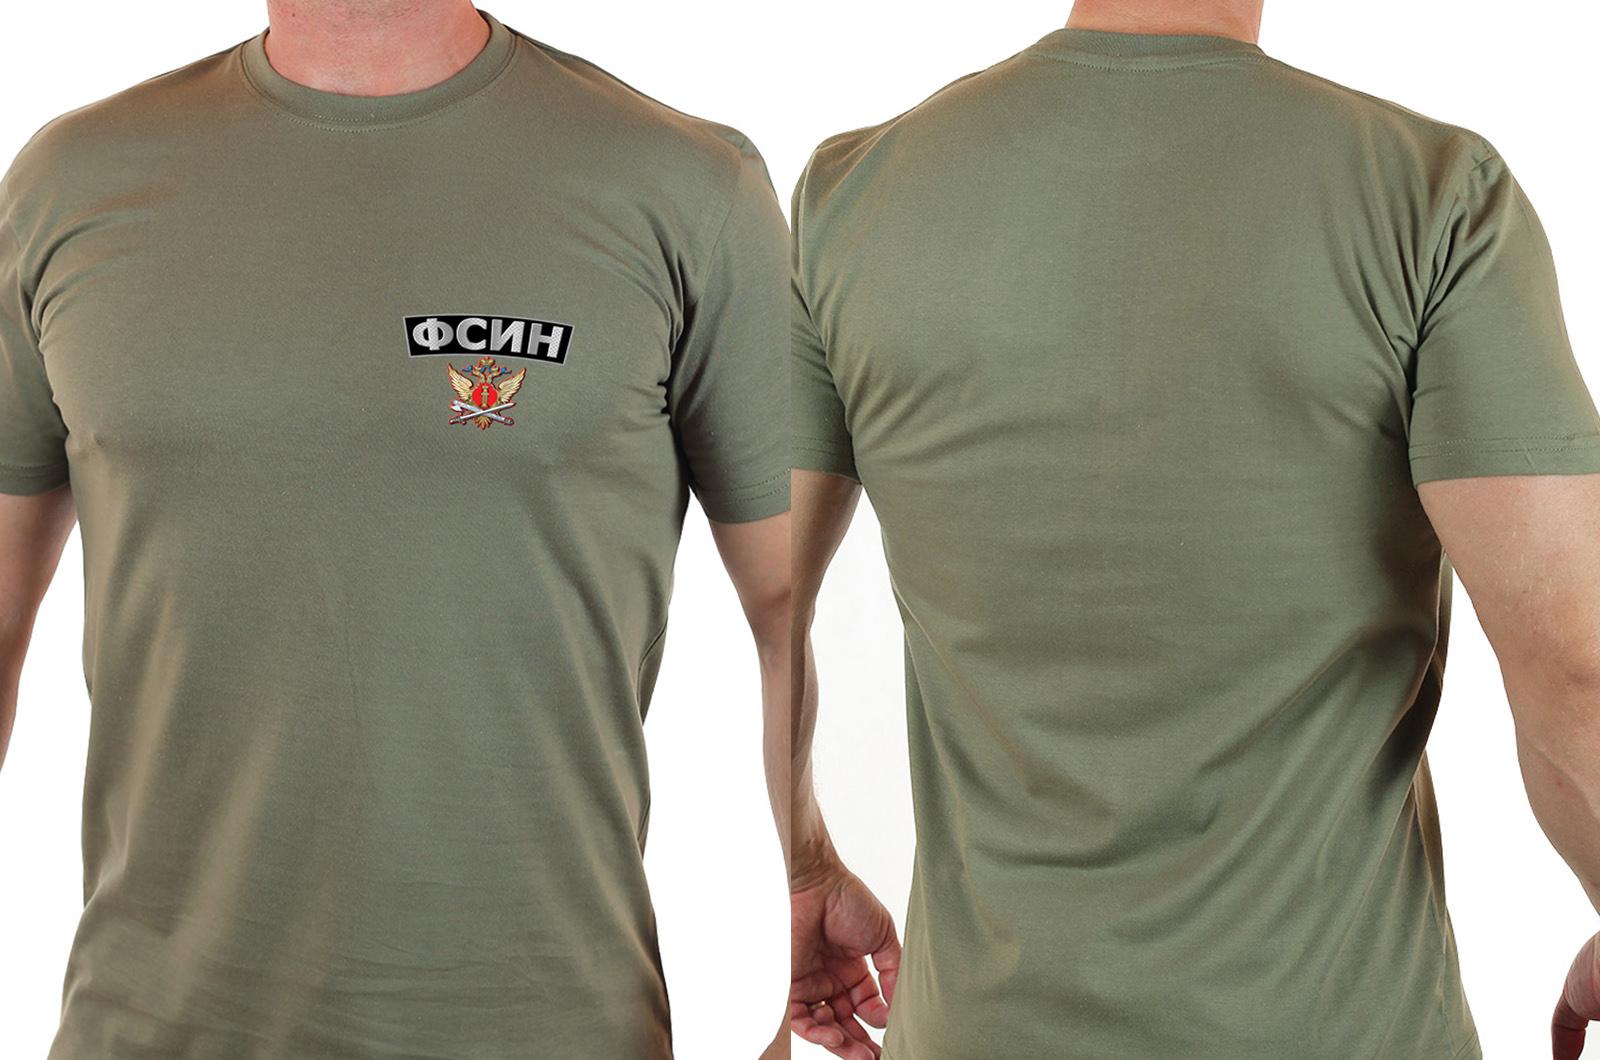 Мужская милитари футболка ФСИН, короткий рукав.